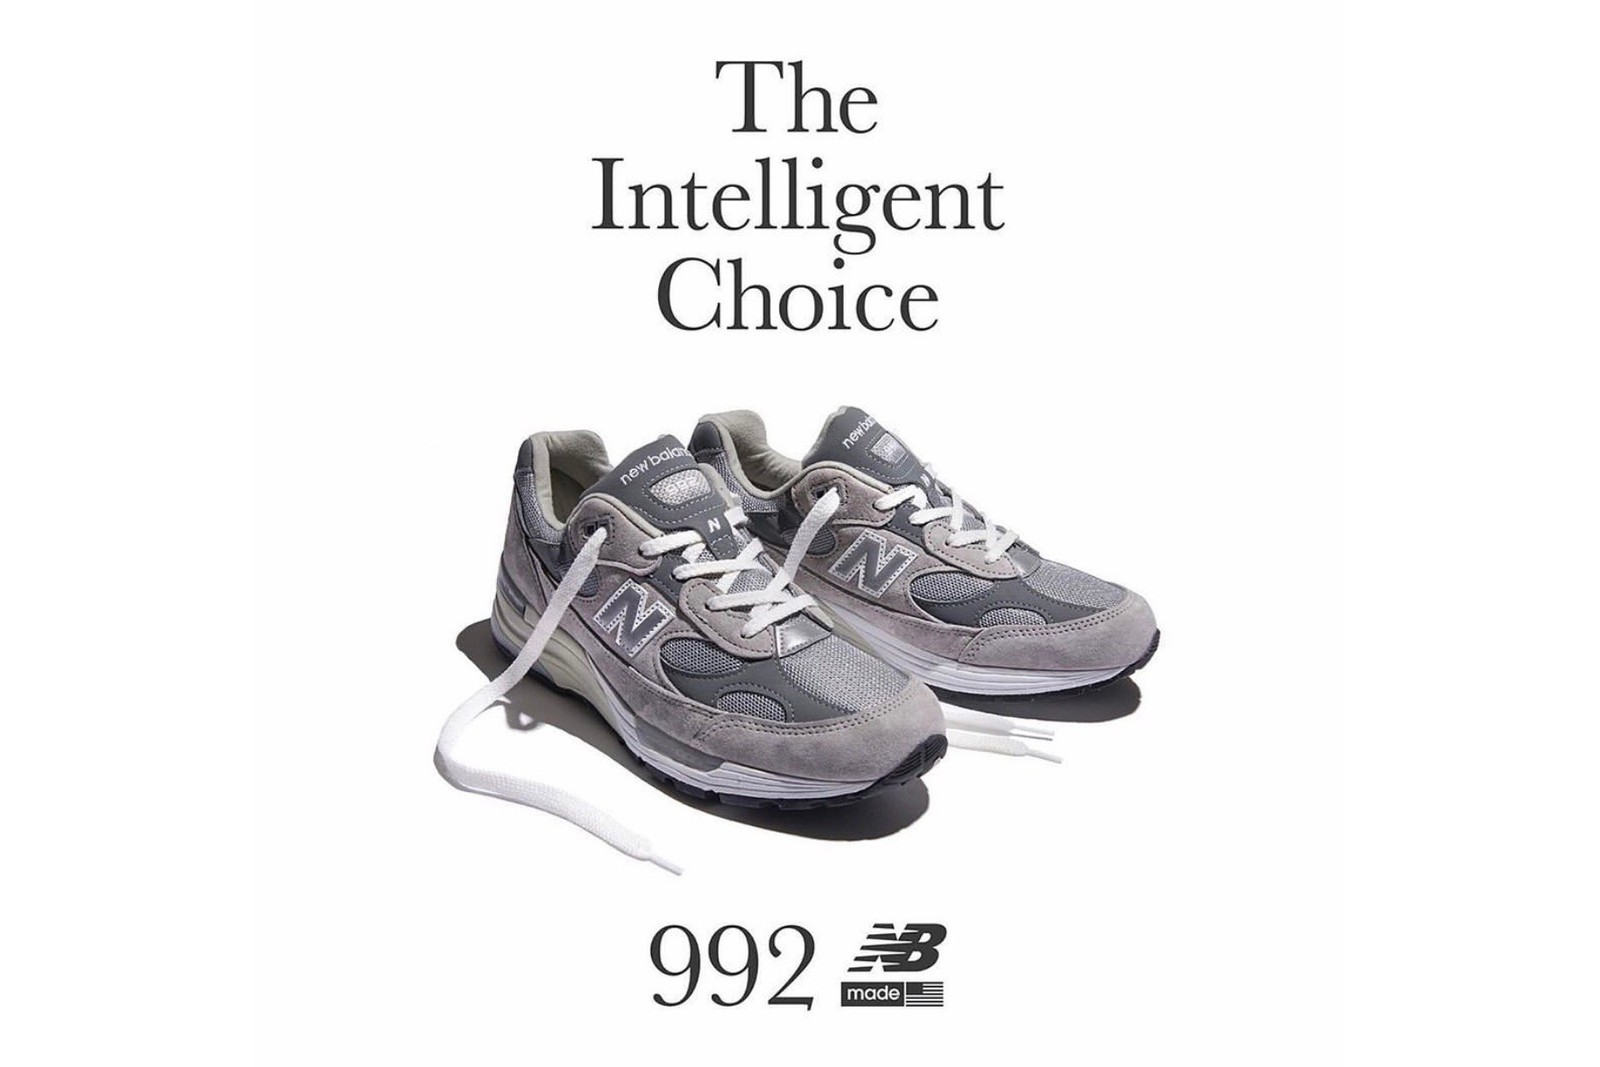 WTAPS® x New Balance「M992WT」为 992 企划打响头炮,西山彻亲自解析鞋款配色及细节由来